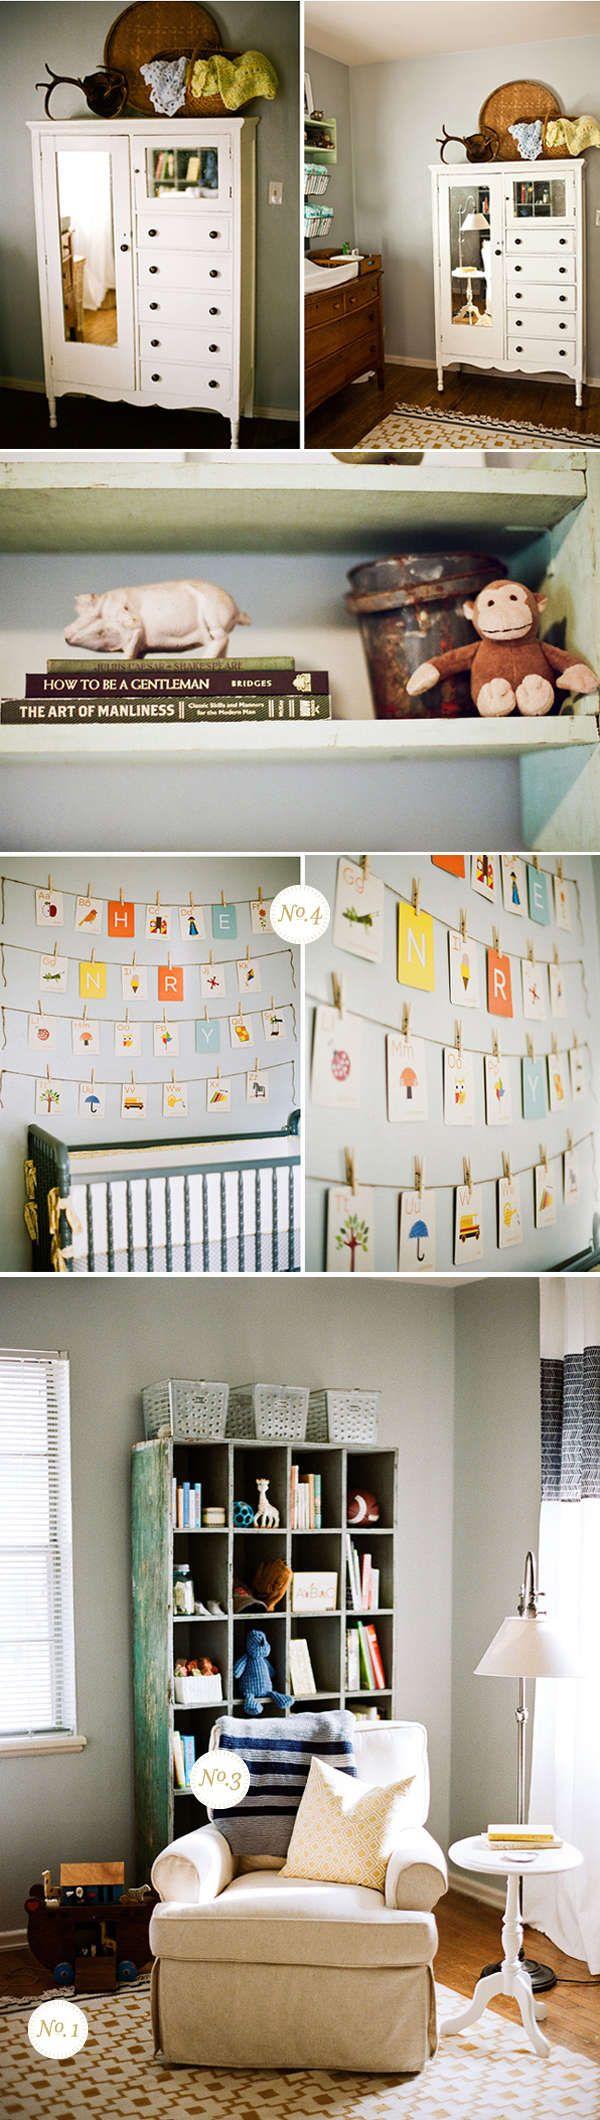 Real nursery: Henry's Thoughtfully Vintage Nursery